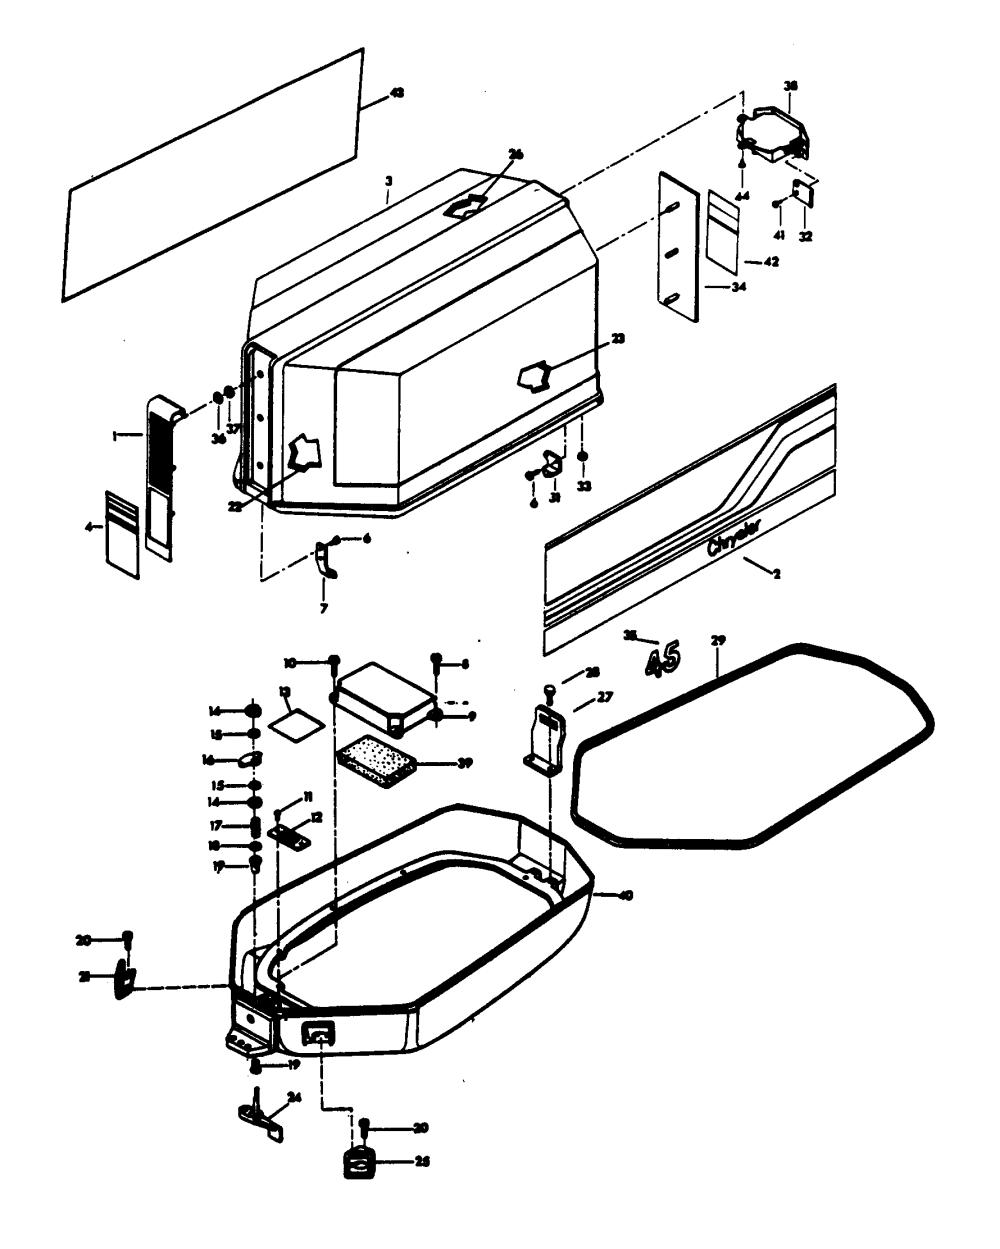 medium resolution of  chrysler 45 1979 457b9k diagram of 45 1979 mercury chrysler outboard 459h9h alternator and